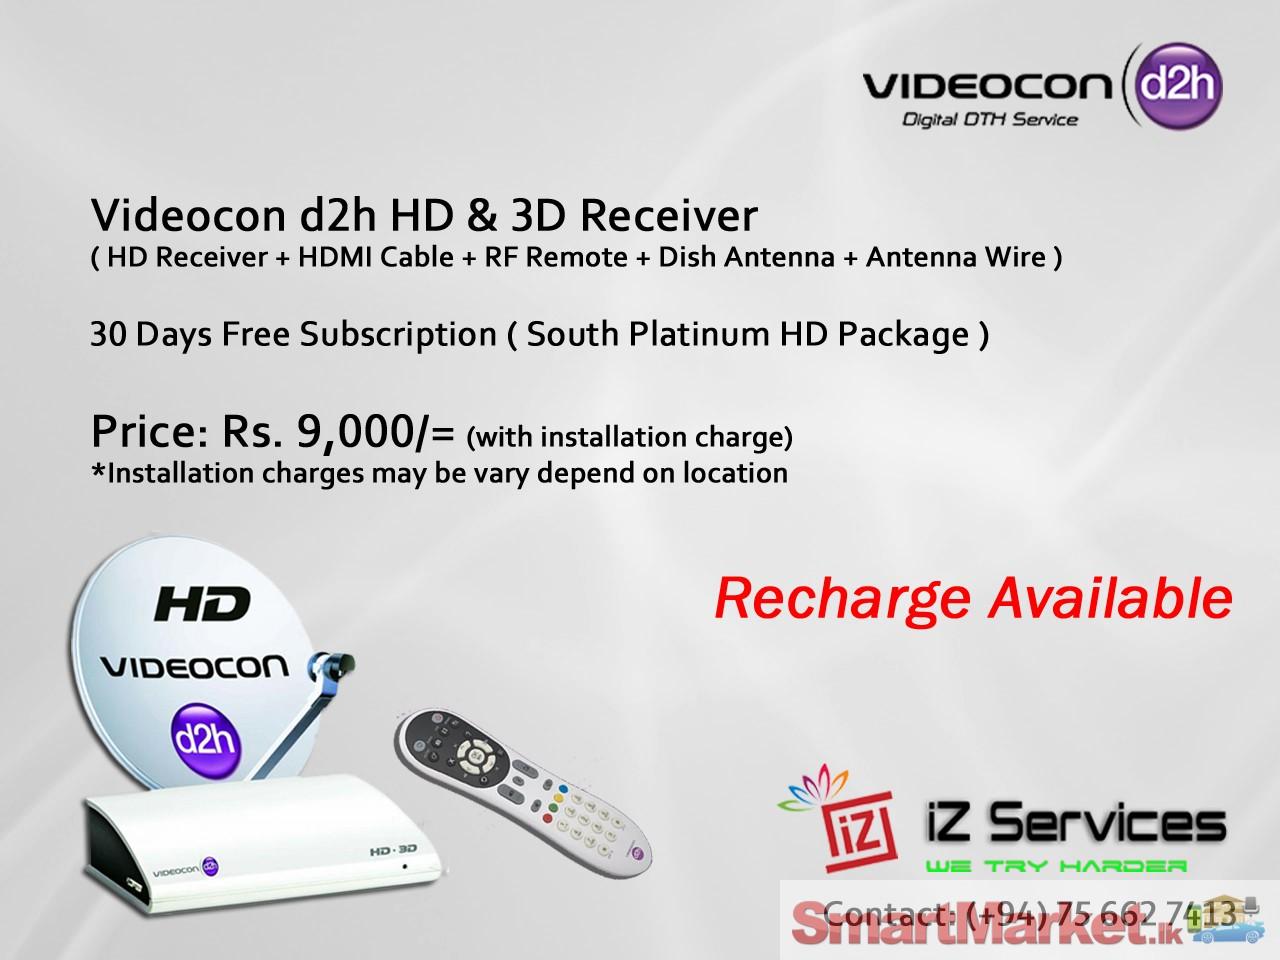 Videocon d2h SD, HD & 3D Receivers